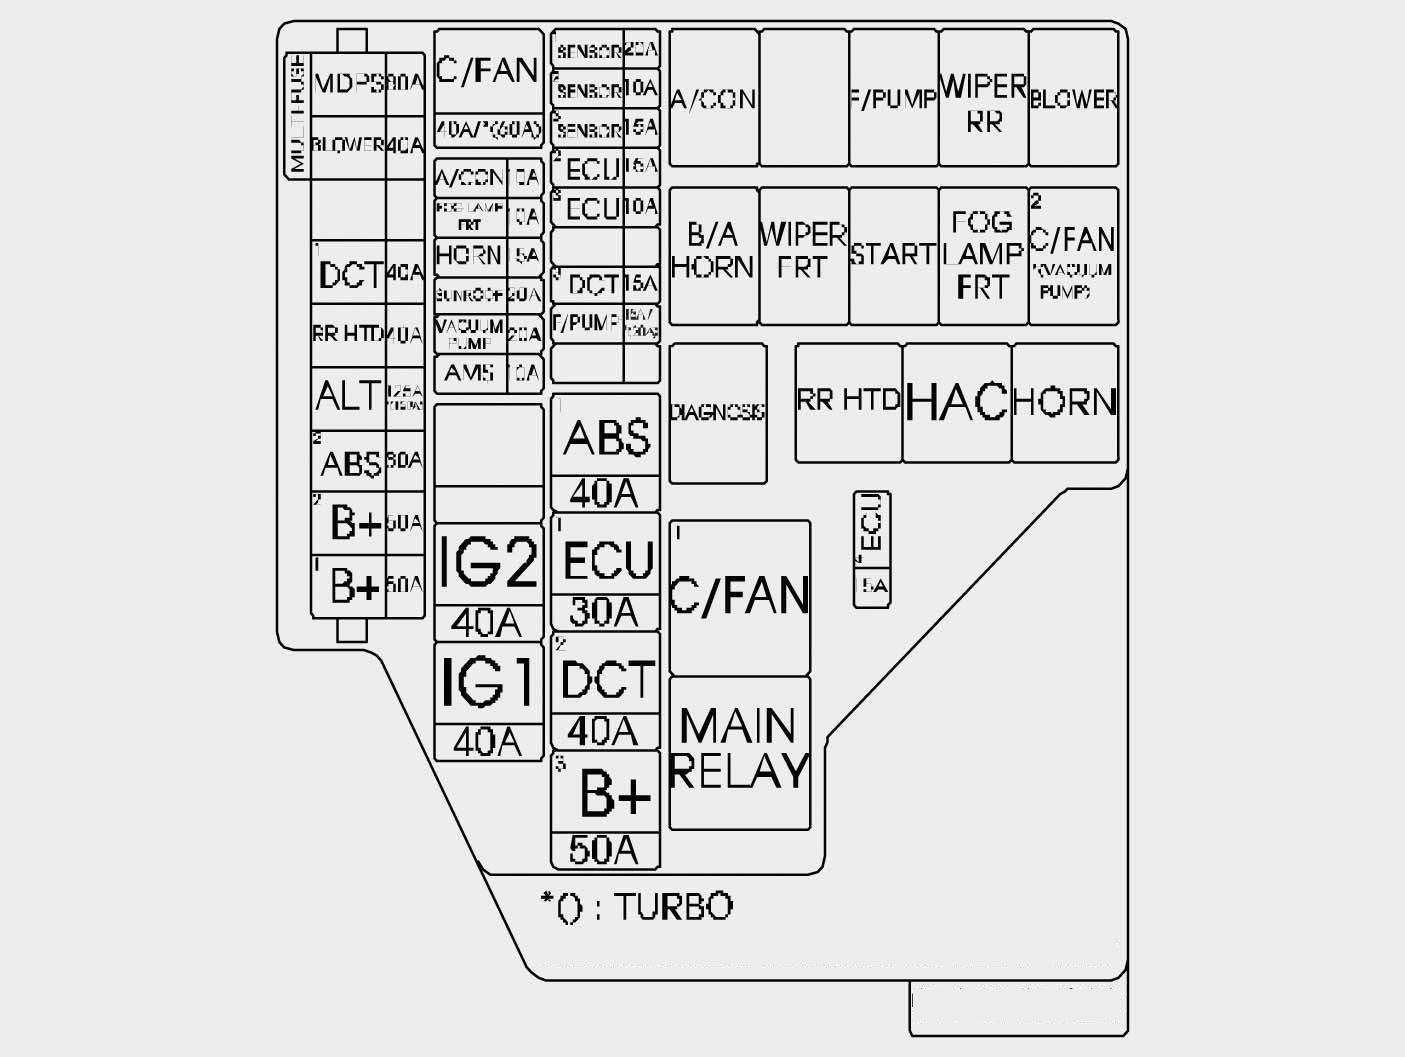 Hyundai Veloster Fuse Diagram Wiring Diagrams For Dummies Radio Schematic Data Rh 34 American Football Ausruestung De 2013 Amp